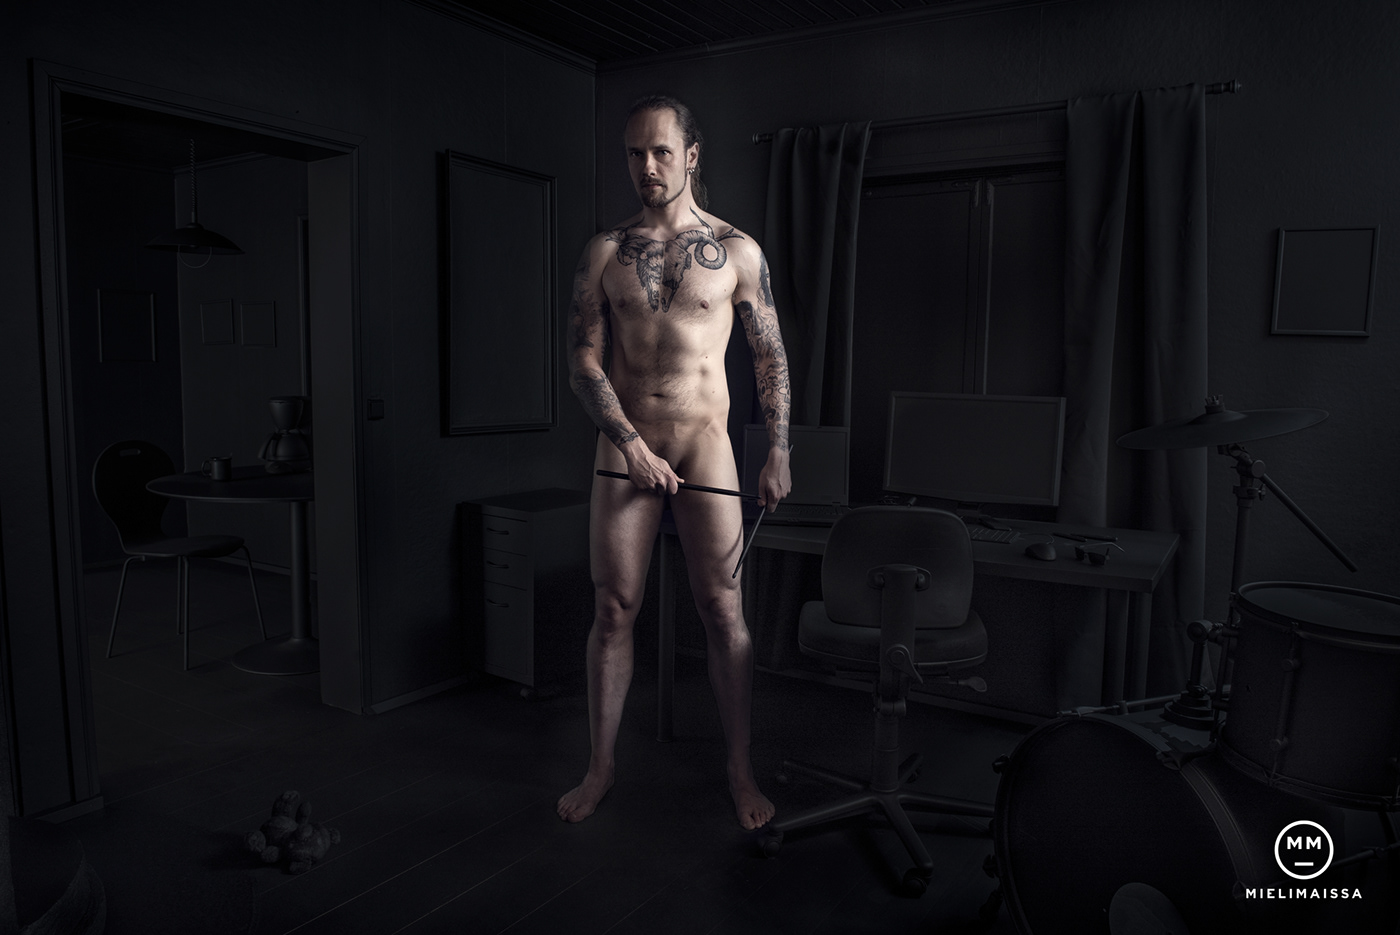 Image may contain: person, wall and man